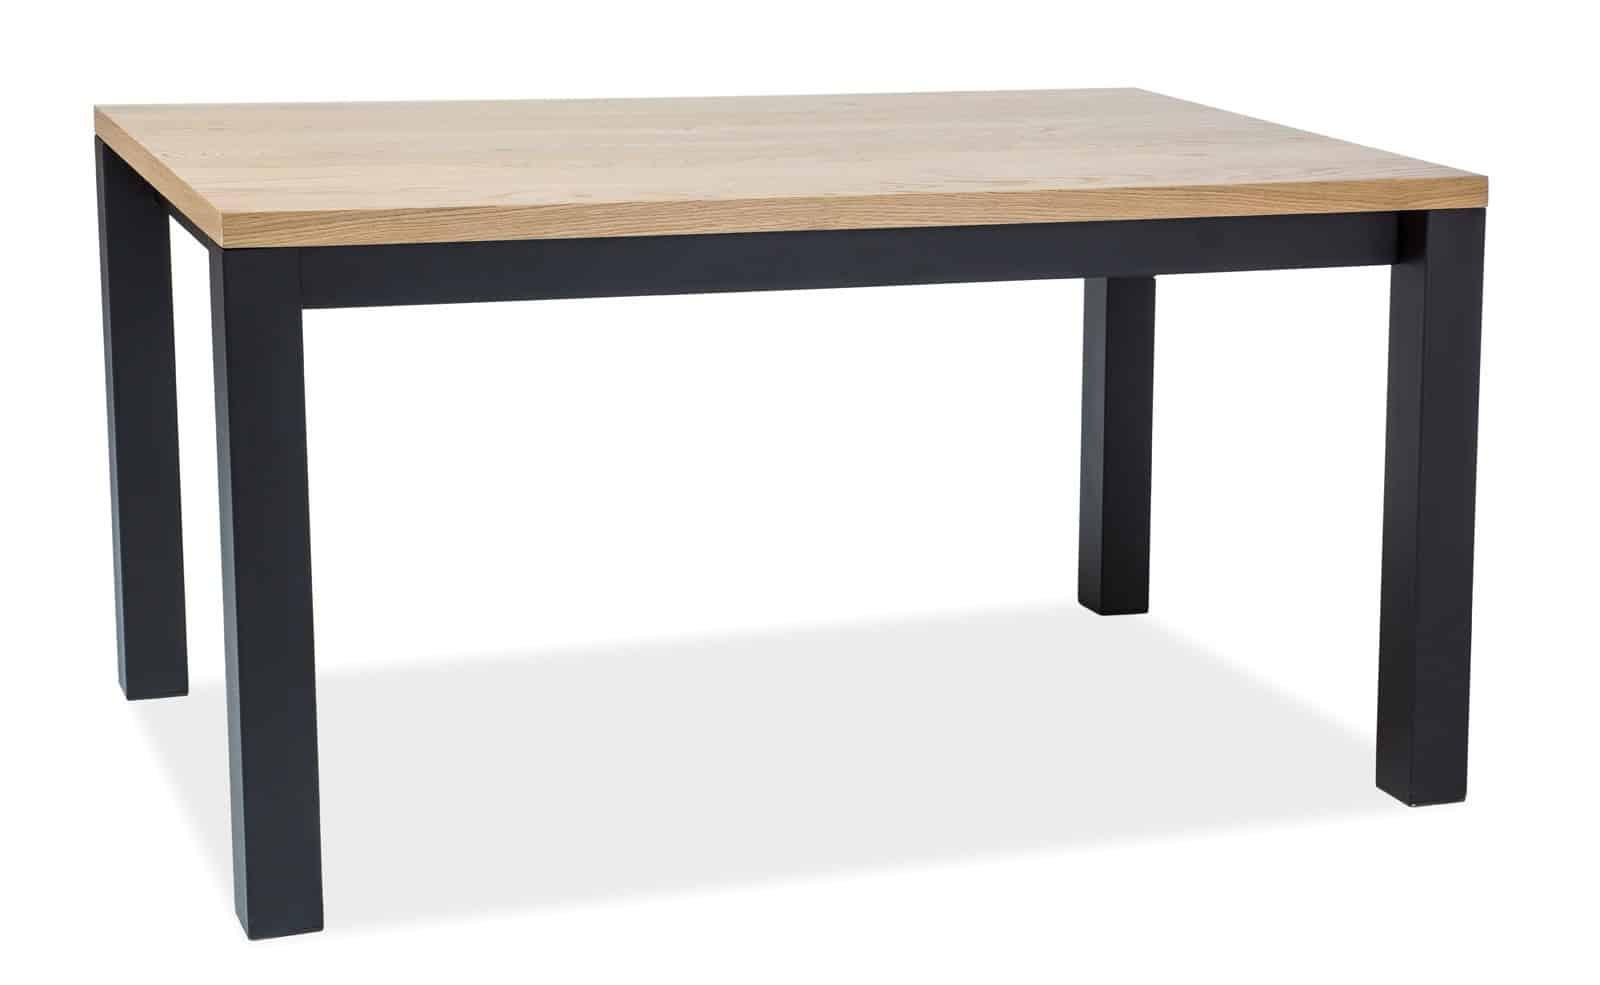 Masa-din-metal-si-lemn-de-stejar-Imperial-L-150-x-l-90-x-h-77-cm